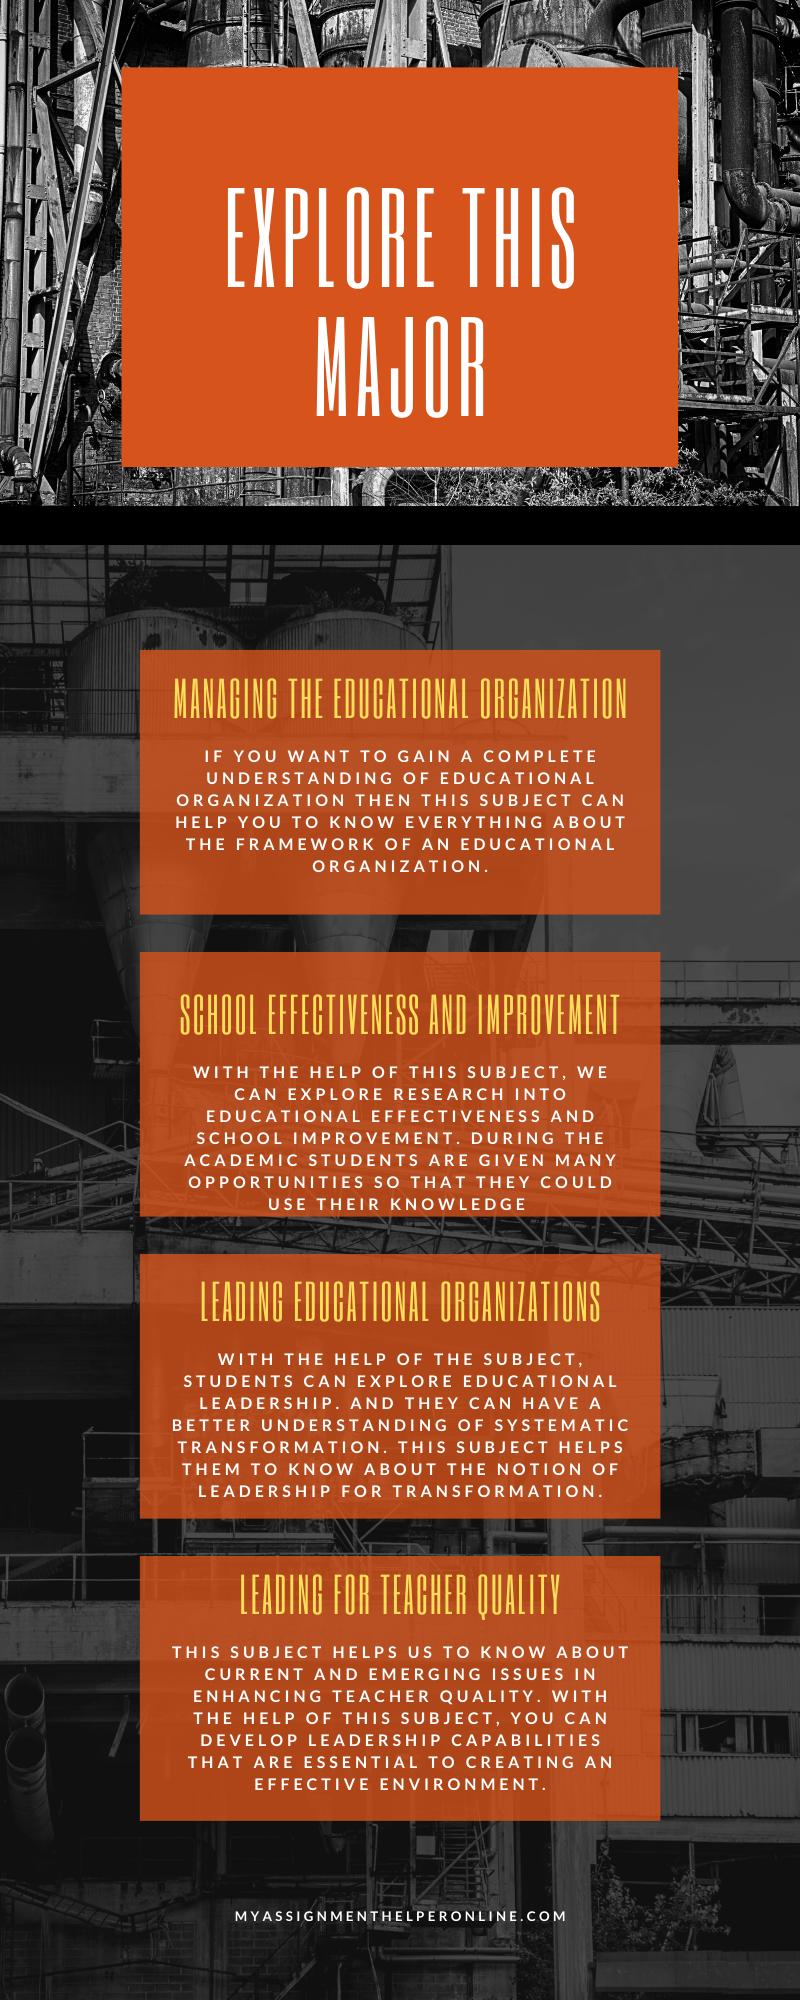 Melbourne-leadership-and-management